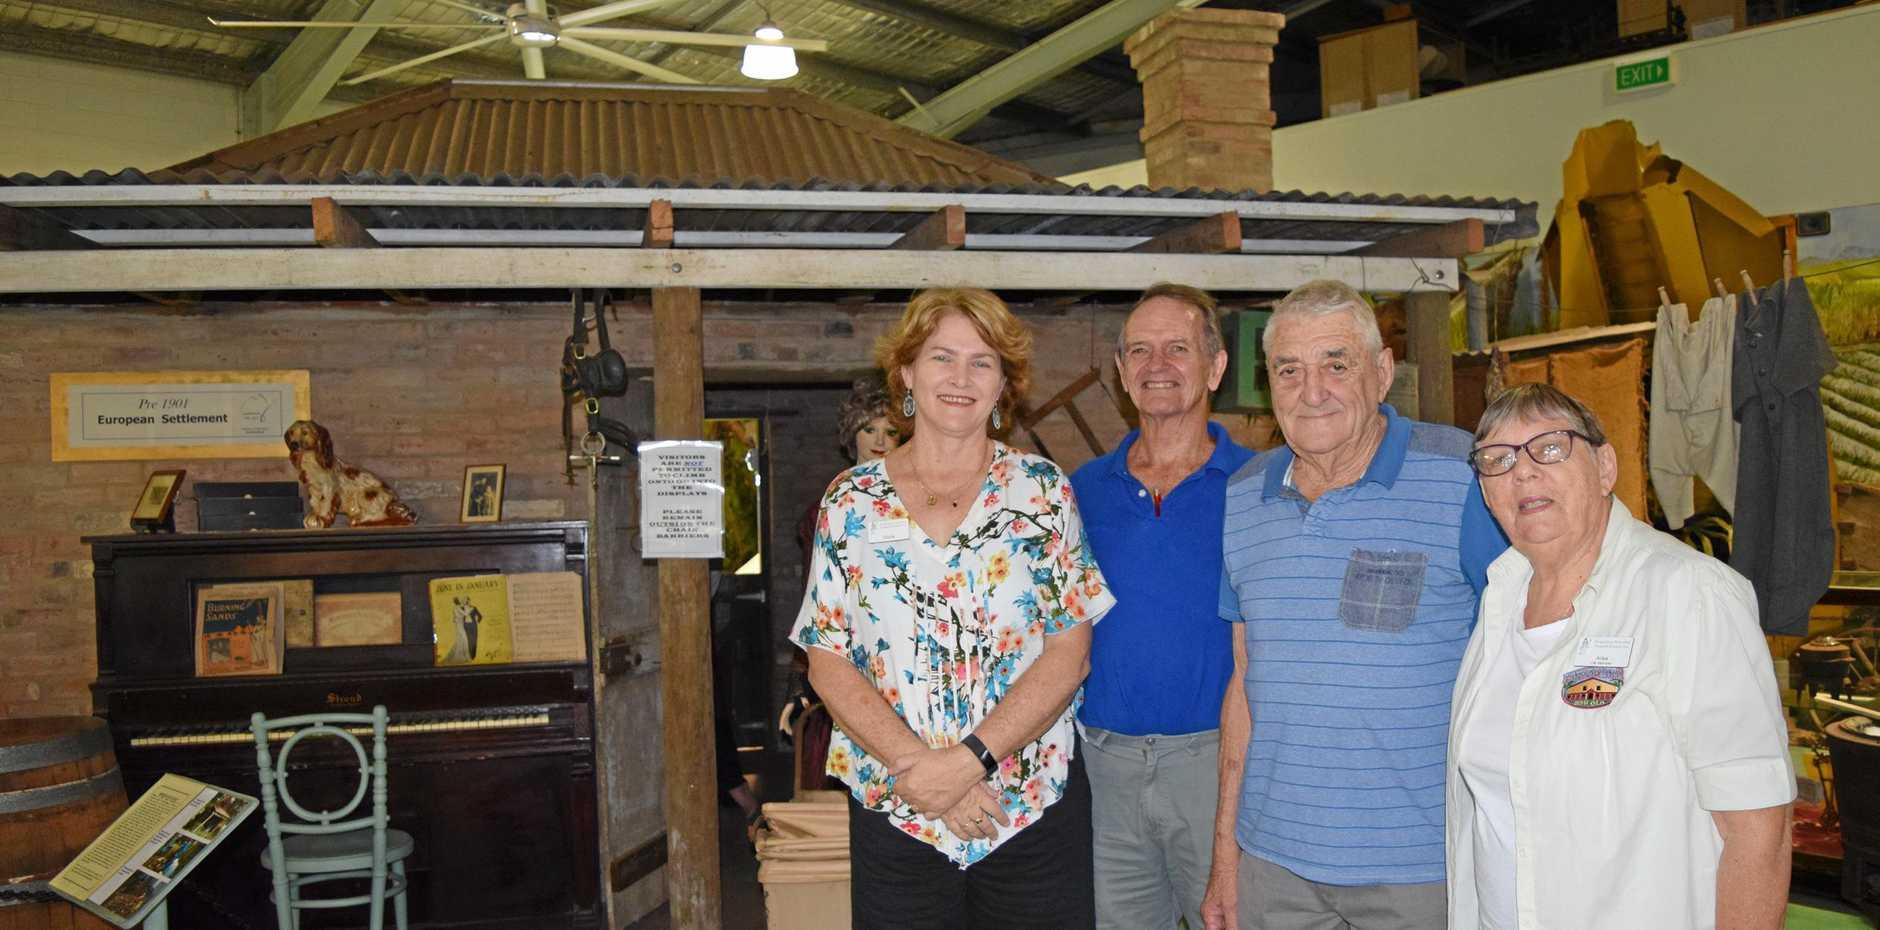 HELPING OUT: Proserpine Historical Museum volunteers Gloria Cowan, Pete Harling, Alan Garlick and Ailsa Reinke.